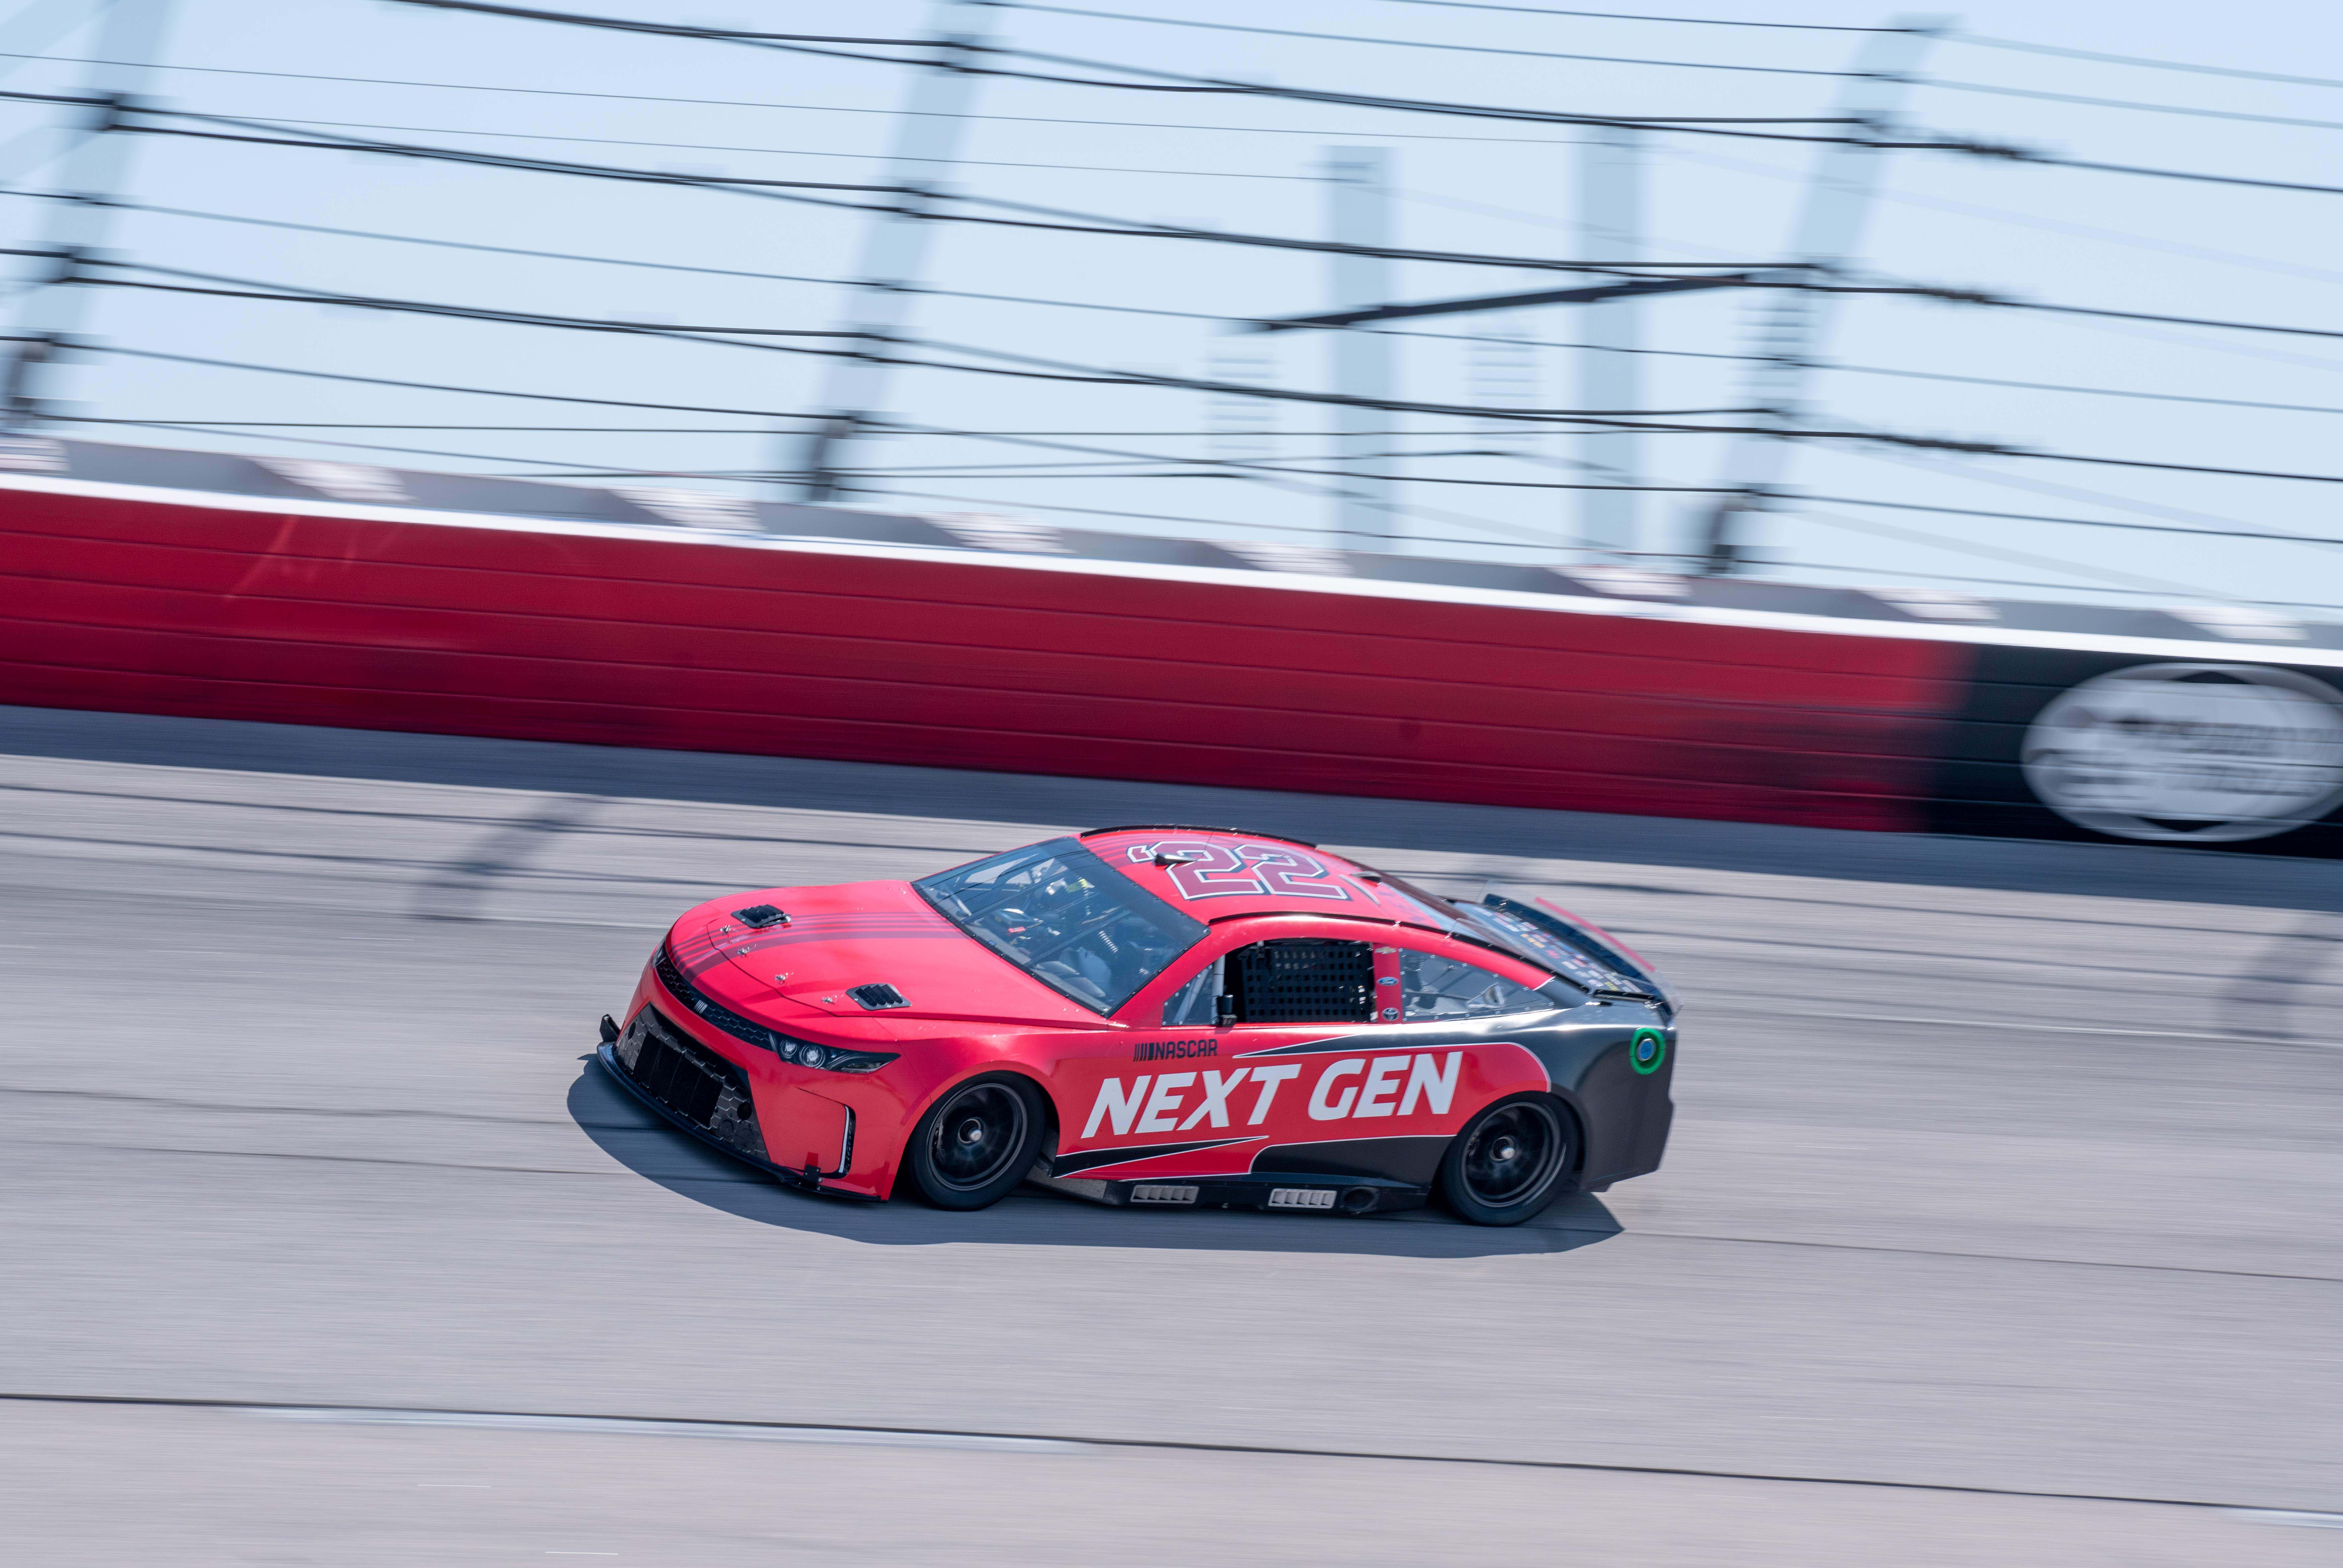 NASCAR Next Gen car photos - Darlington Raceway